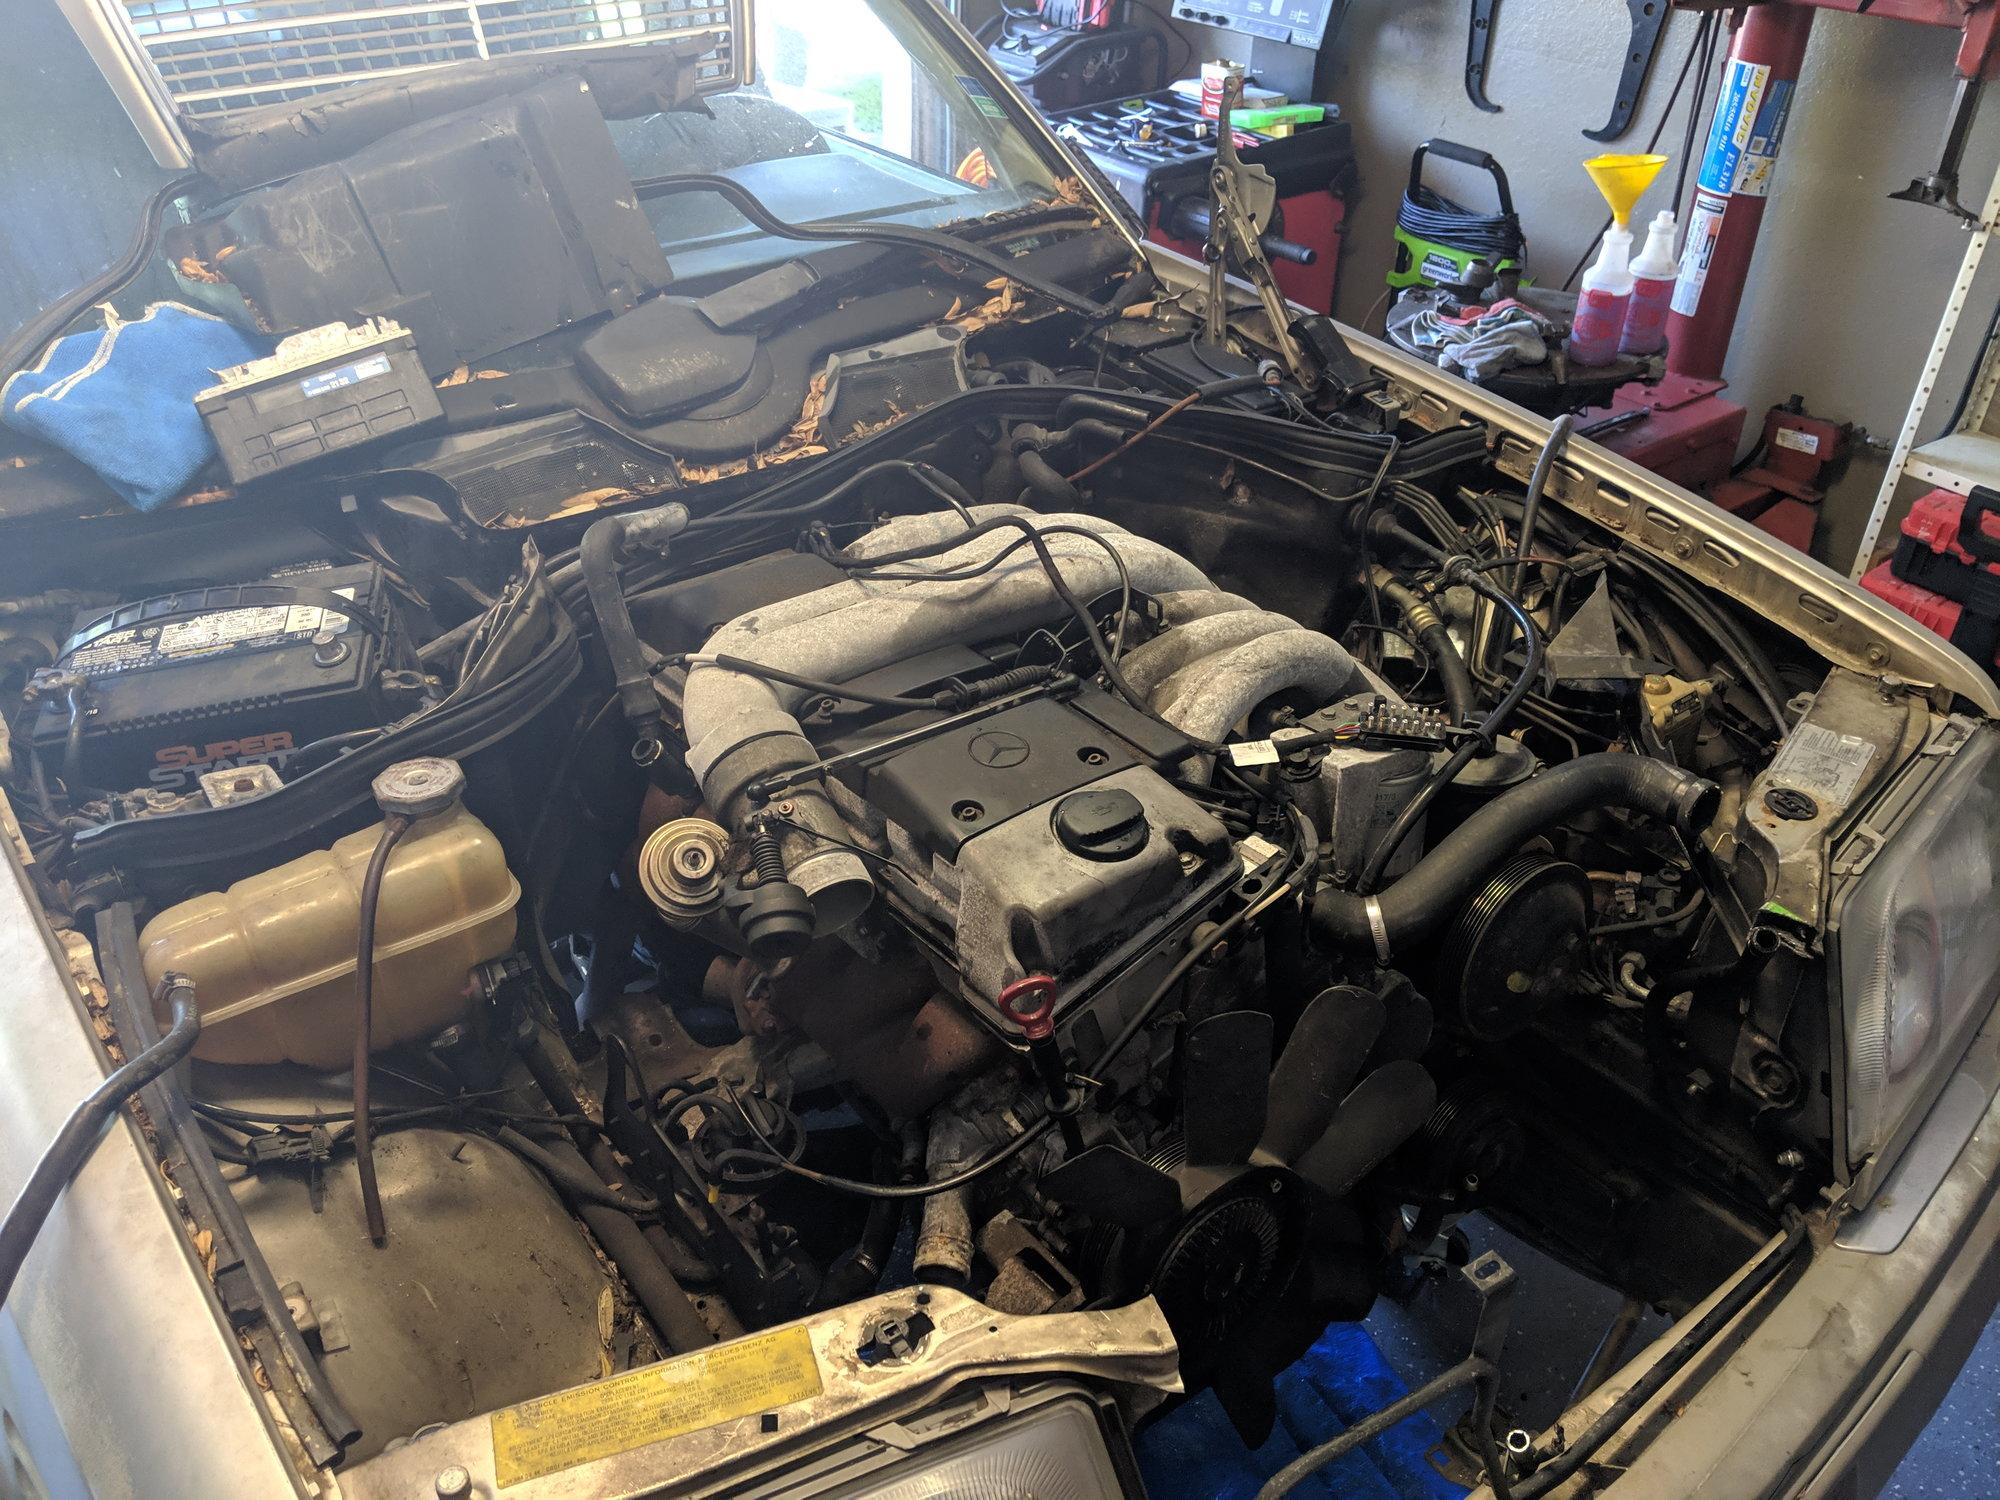 Disco Doc's D2 OM606 diesel swap build thread - Land Rover Forums